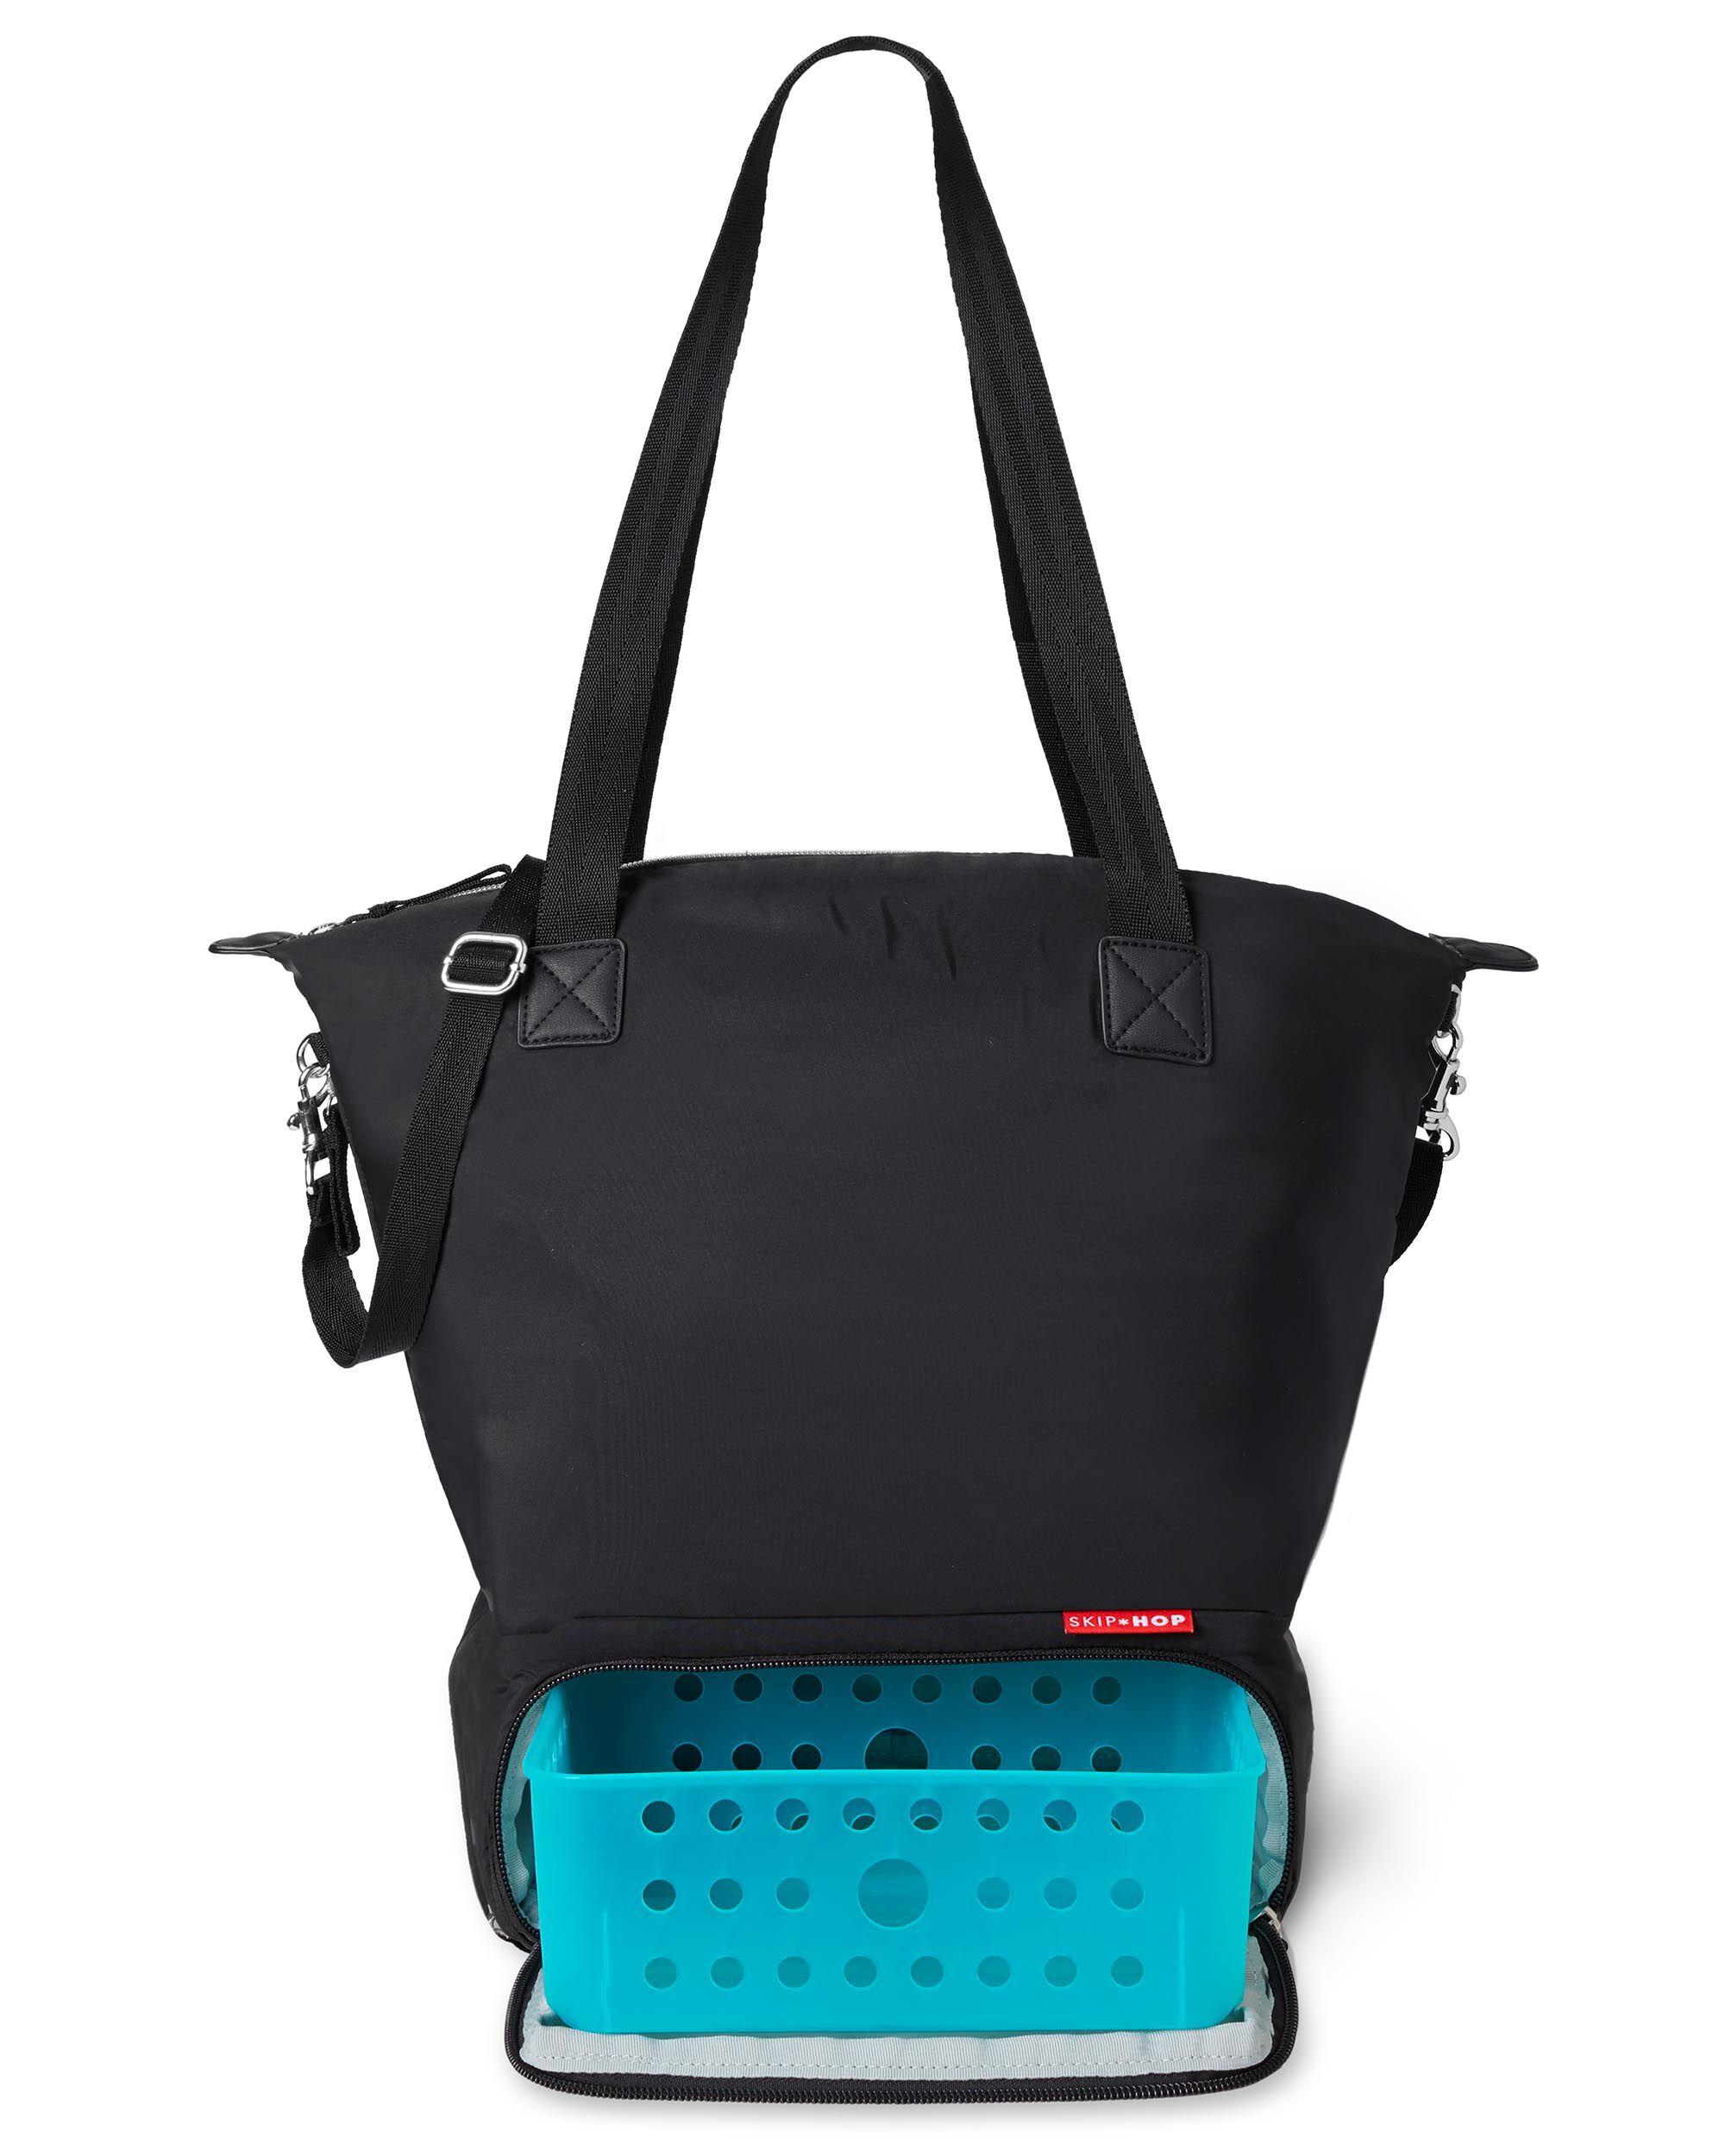 Tray Chic Dry Pump Bag